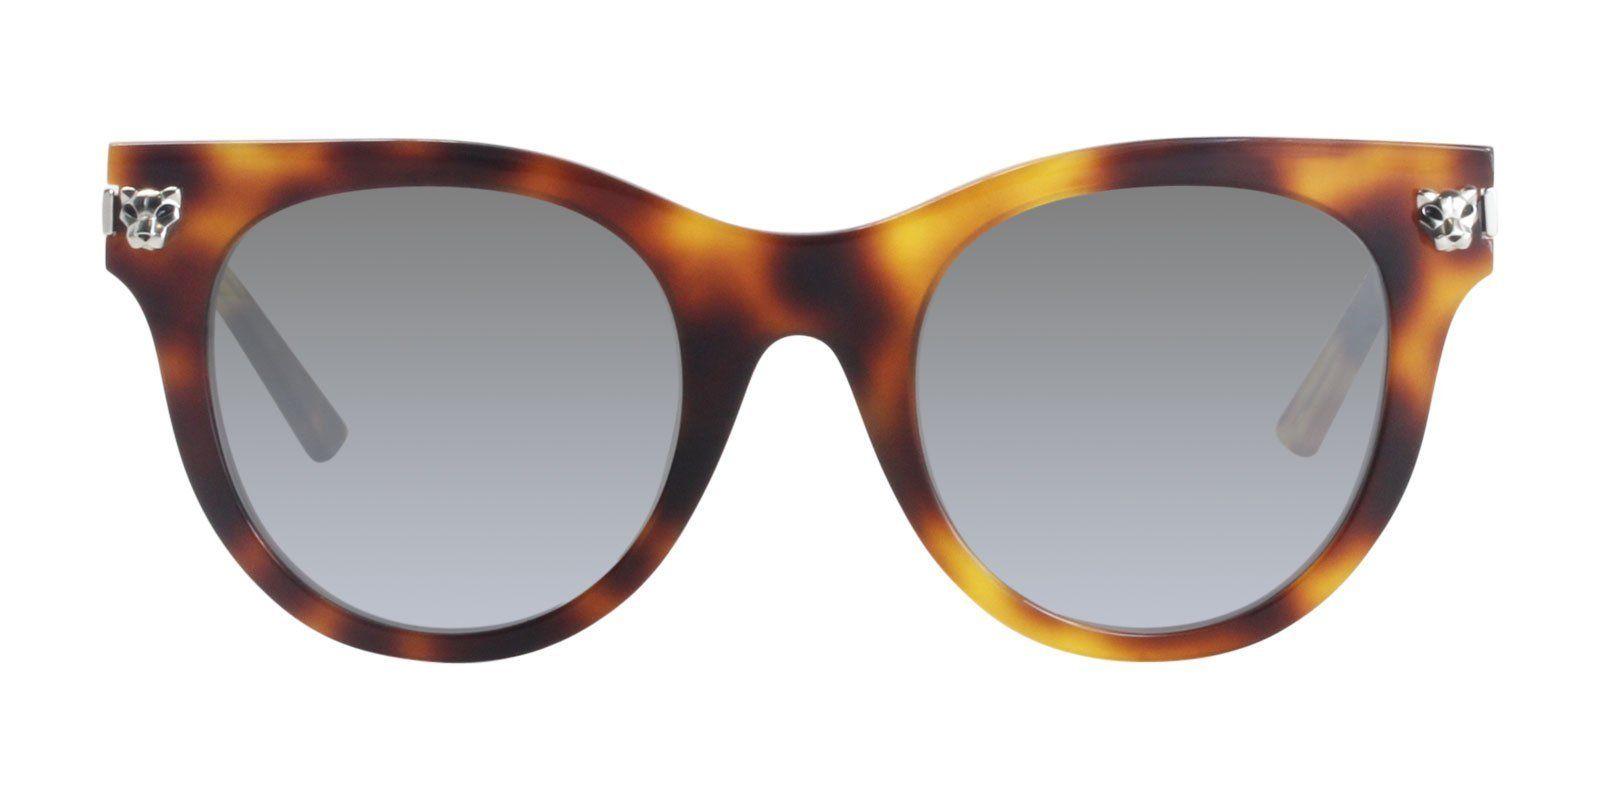 b7b2acd349b Cartier - Panthère de Cartier CT0024S - 003 sunglasses